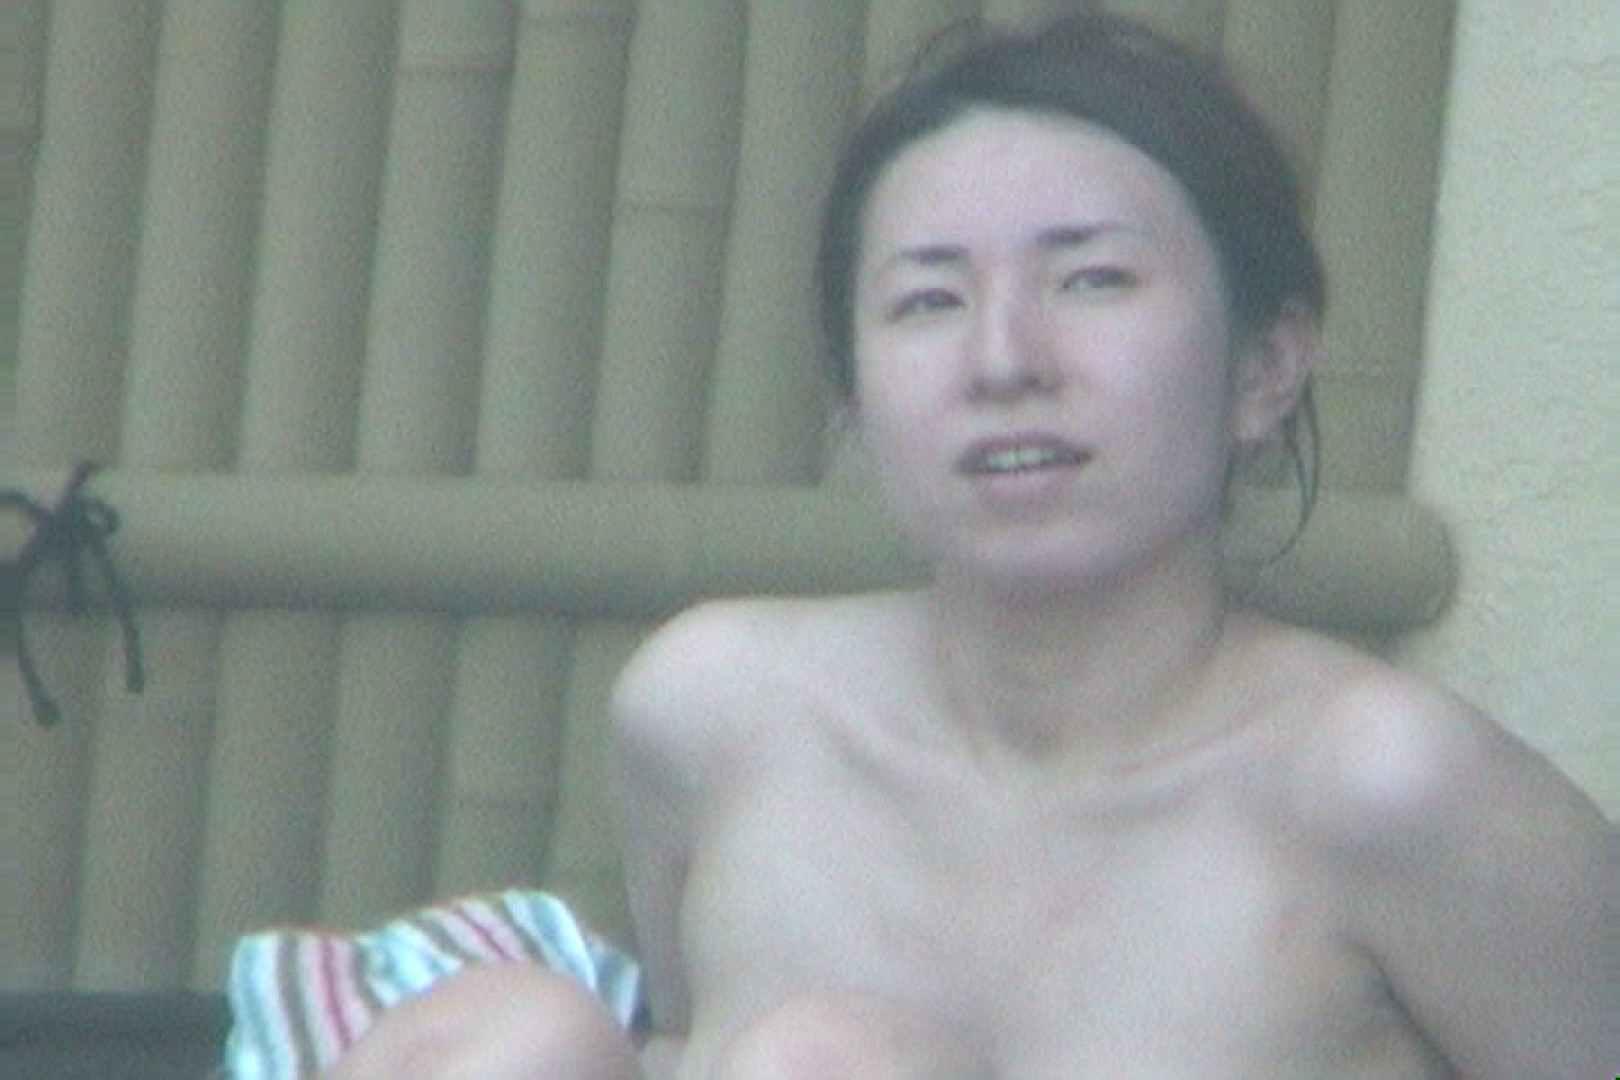 Aquaな露天風呂Vol.106 OLのプライベート  11pic 6